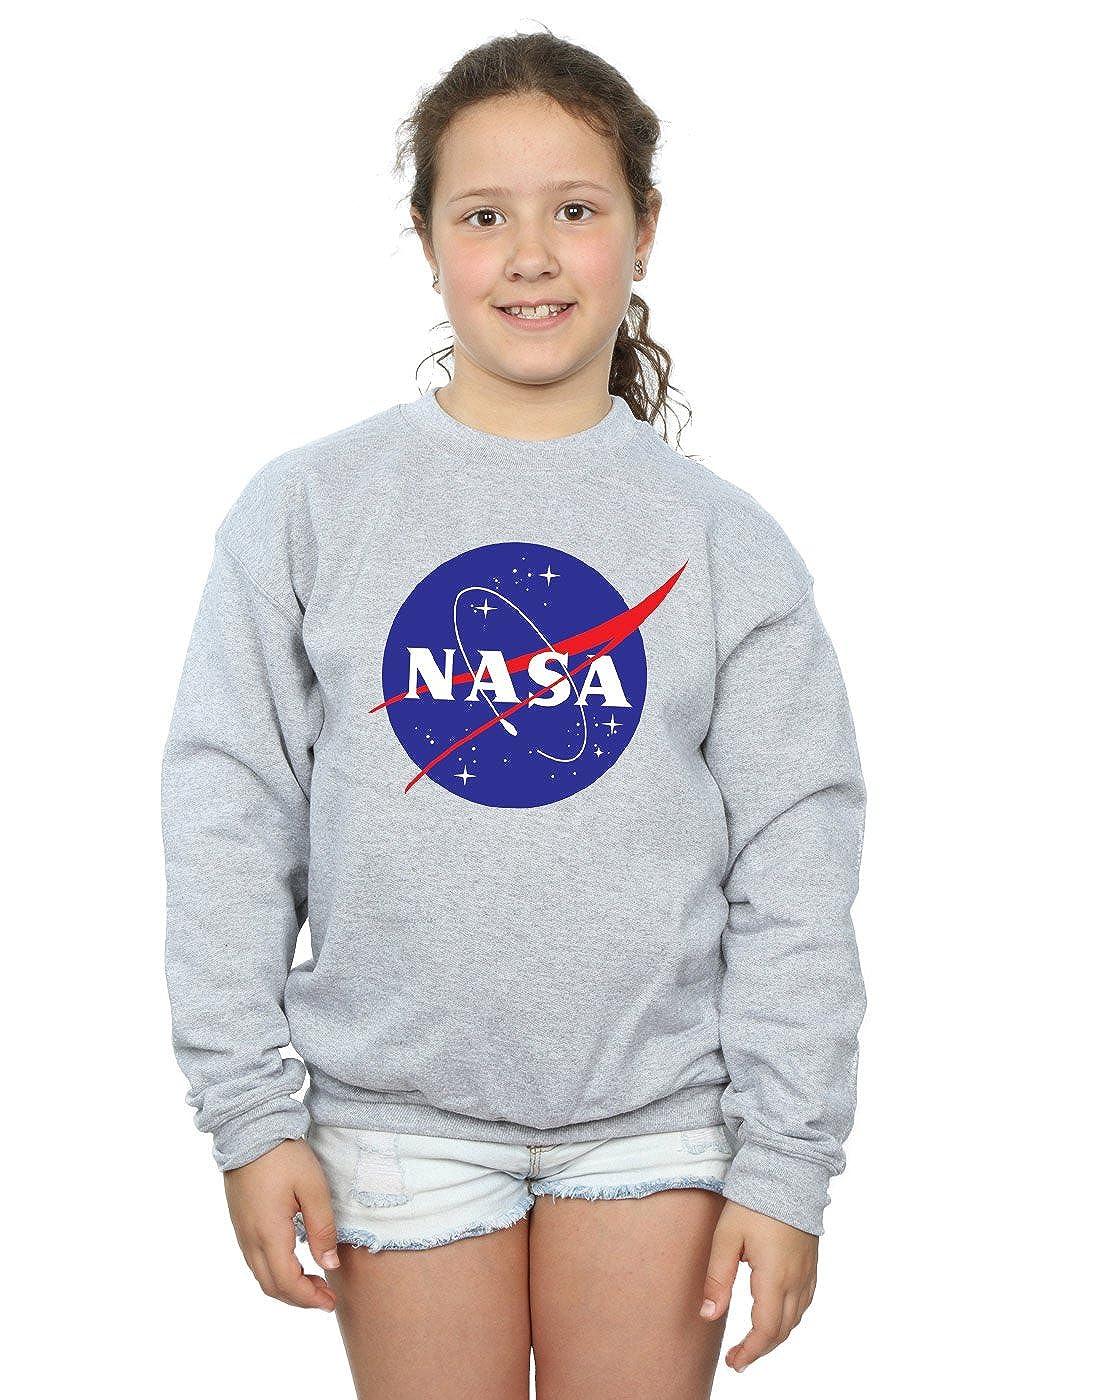 Nasa Girls Classic Insignia Logo Sweatshirt Absolute Cult